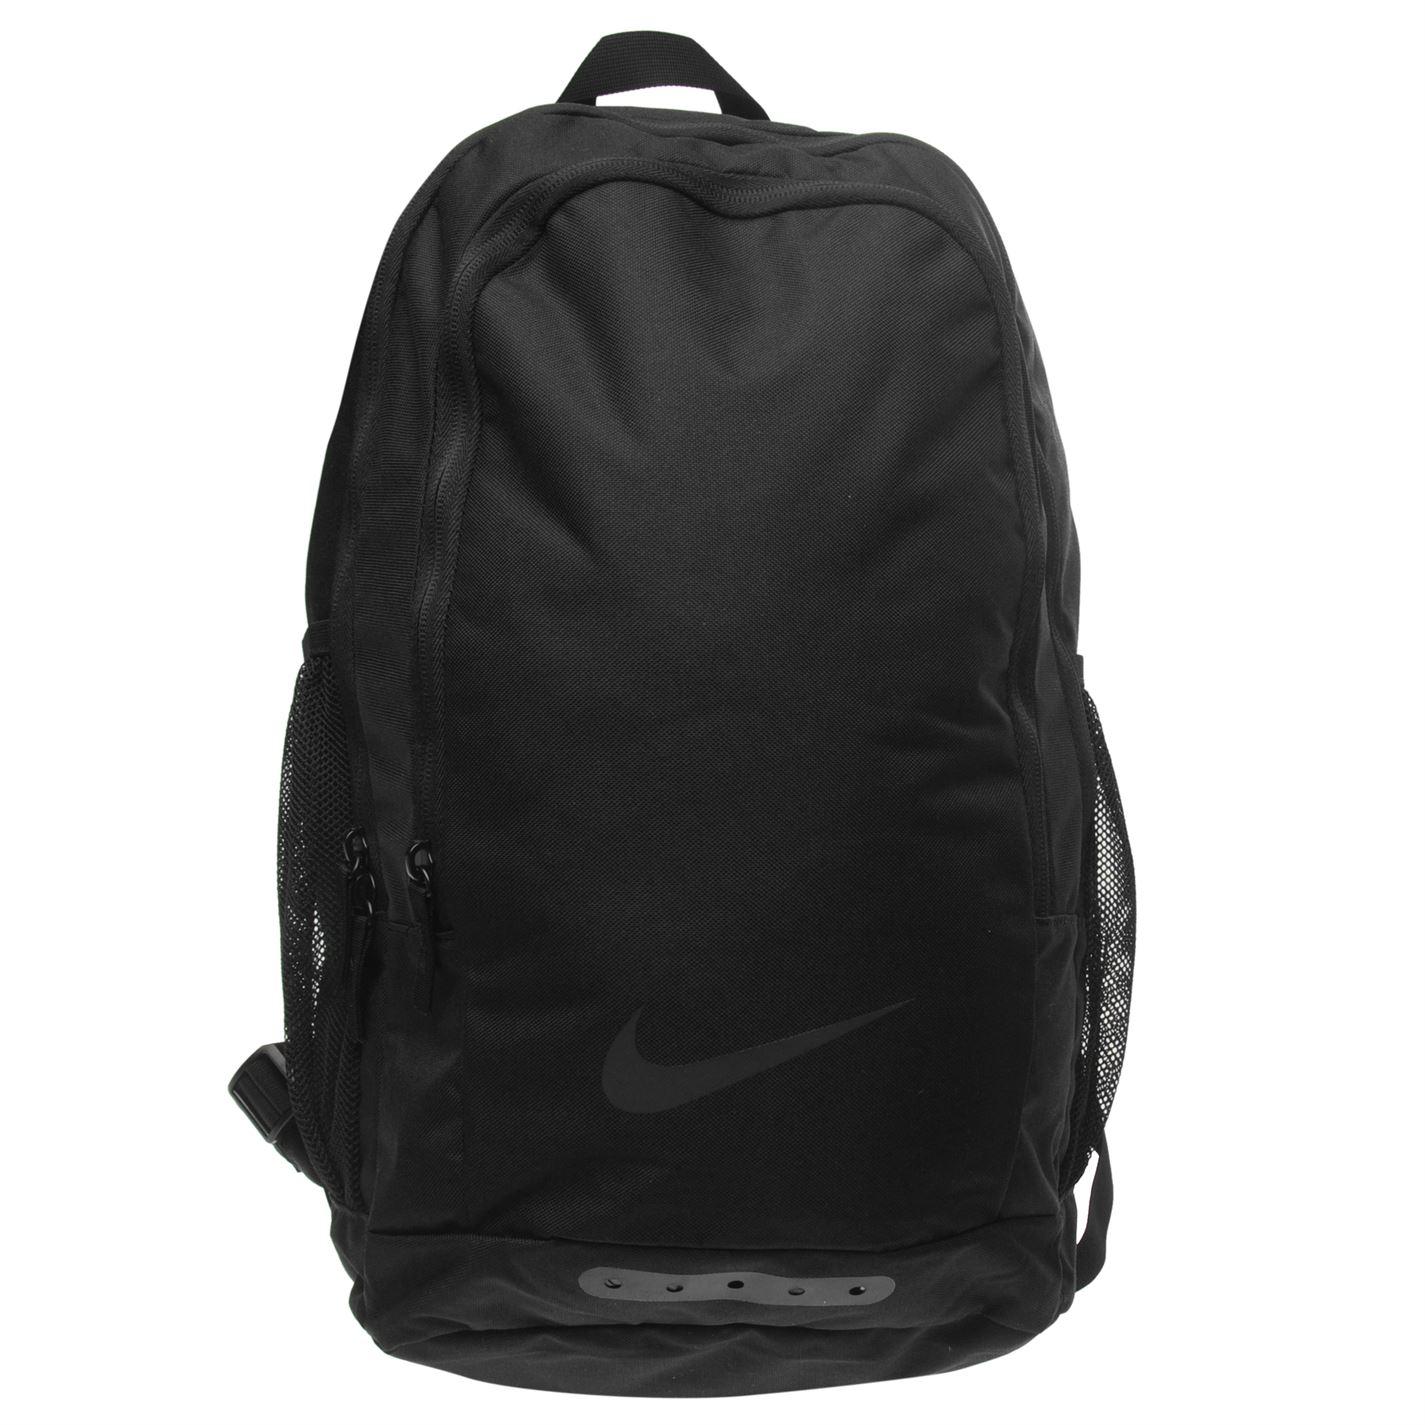 b1018a2b0d Batoh nike academy backpack levně